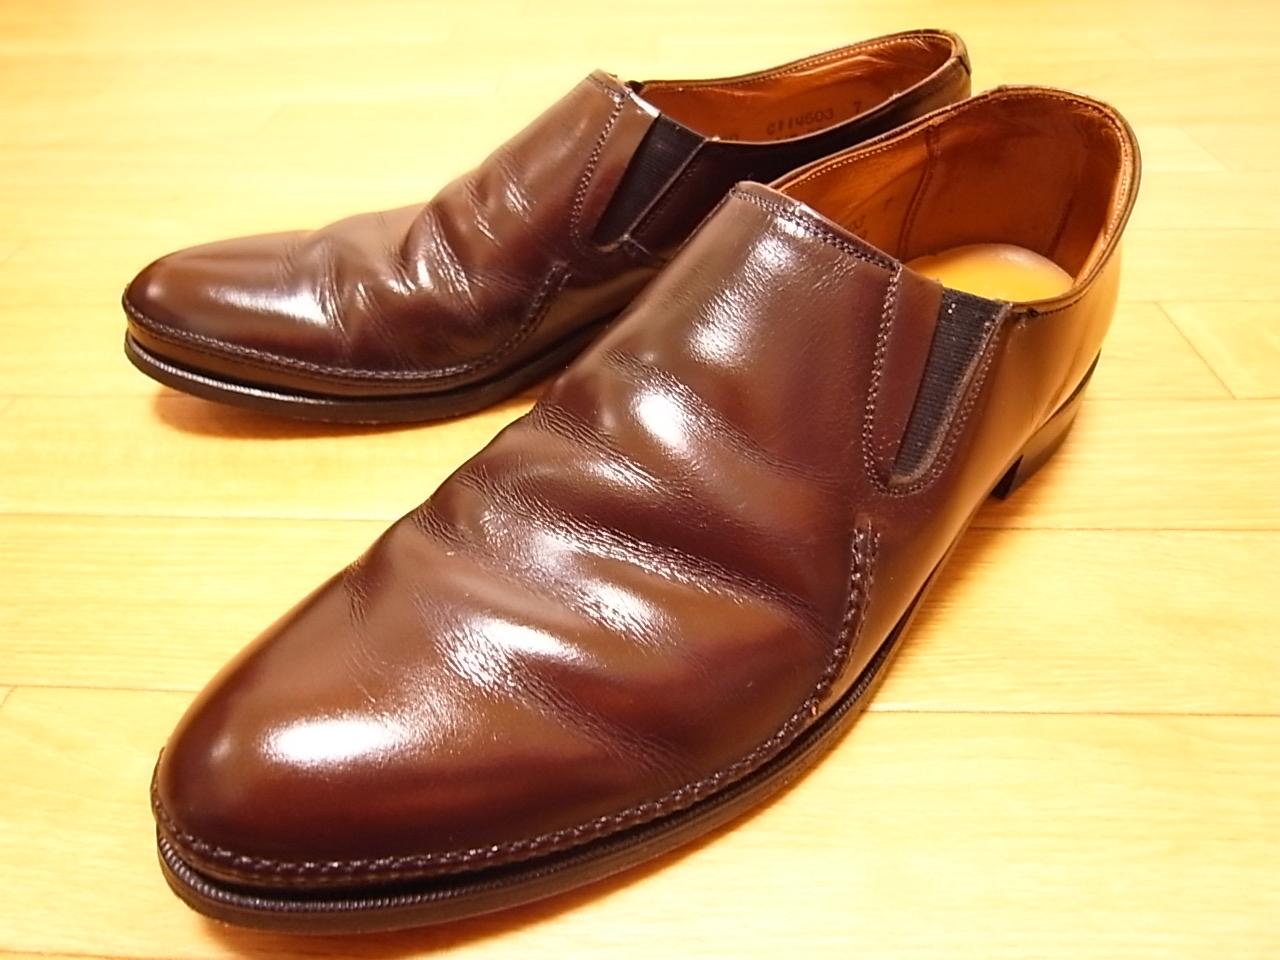 prymouth shoes_a0182722_202843.jpg